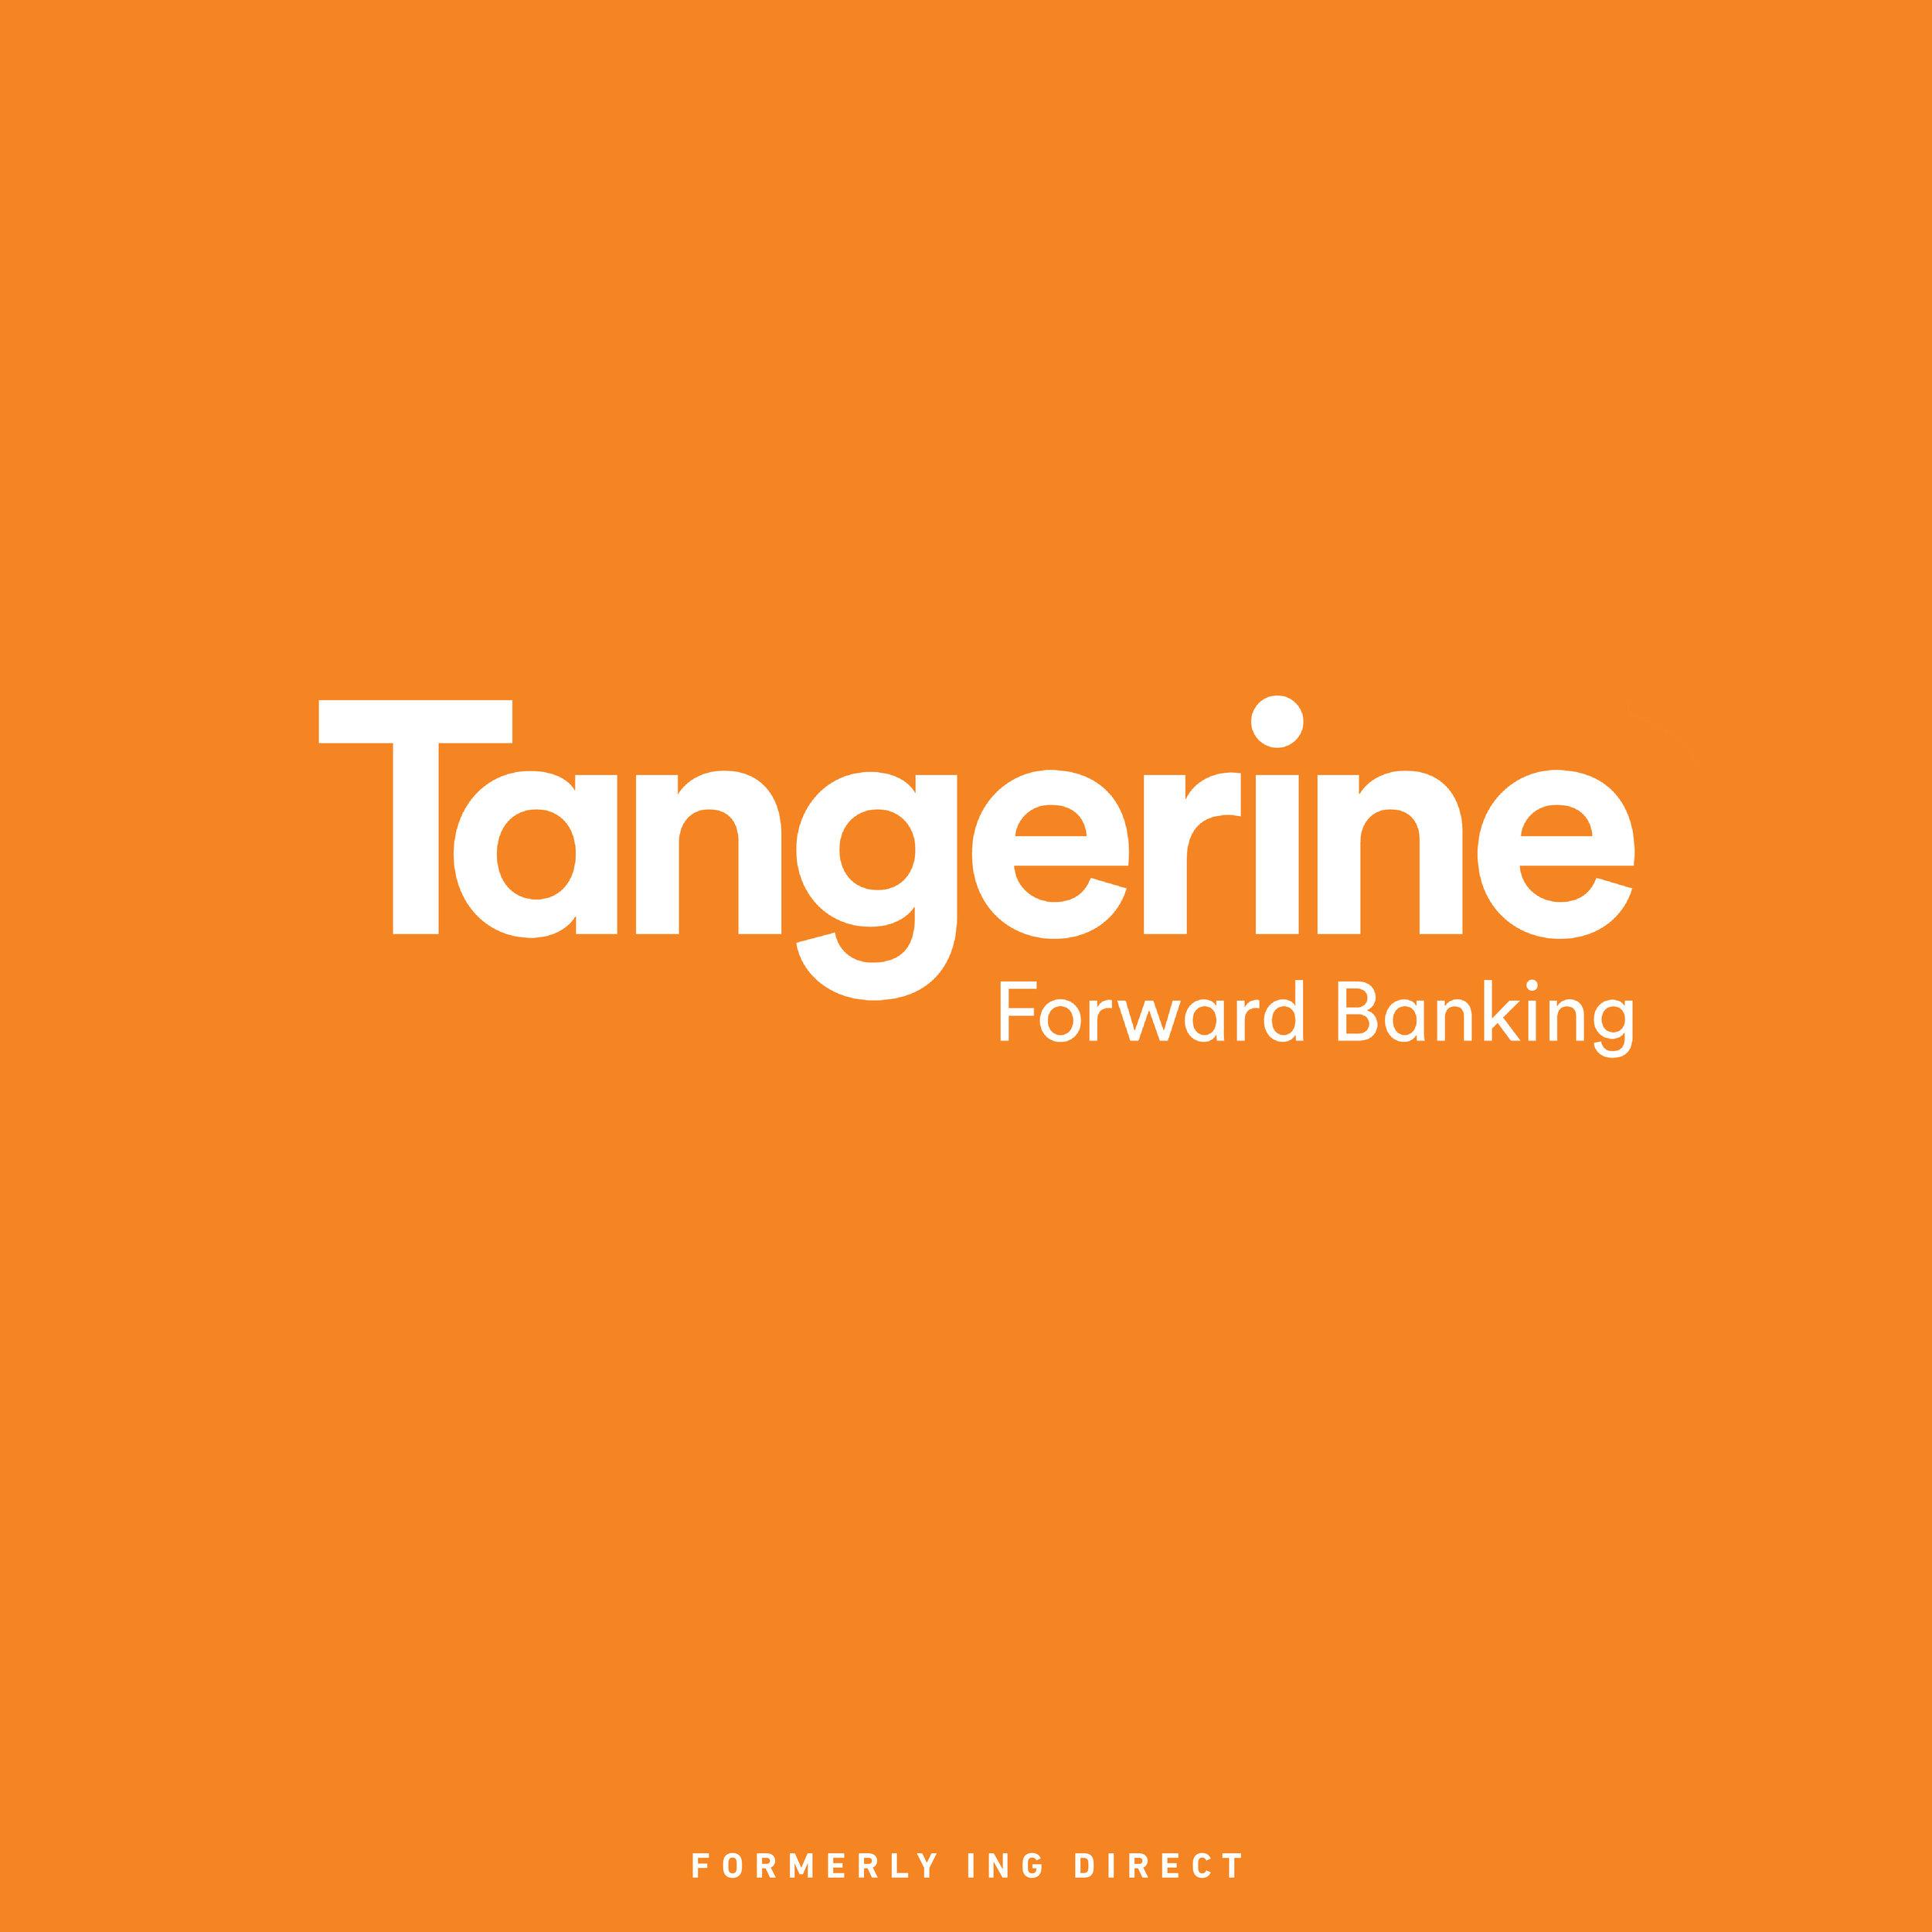 Tangerine (Scotiabank)